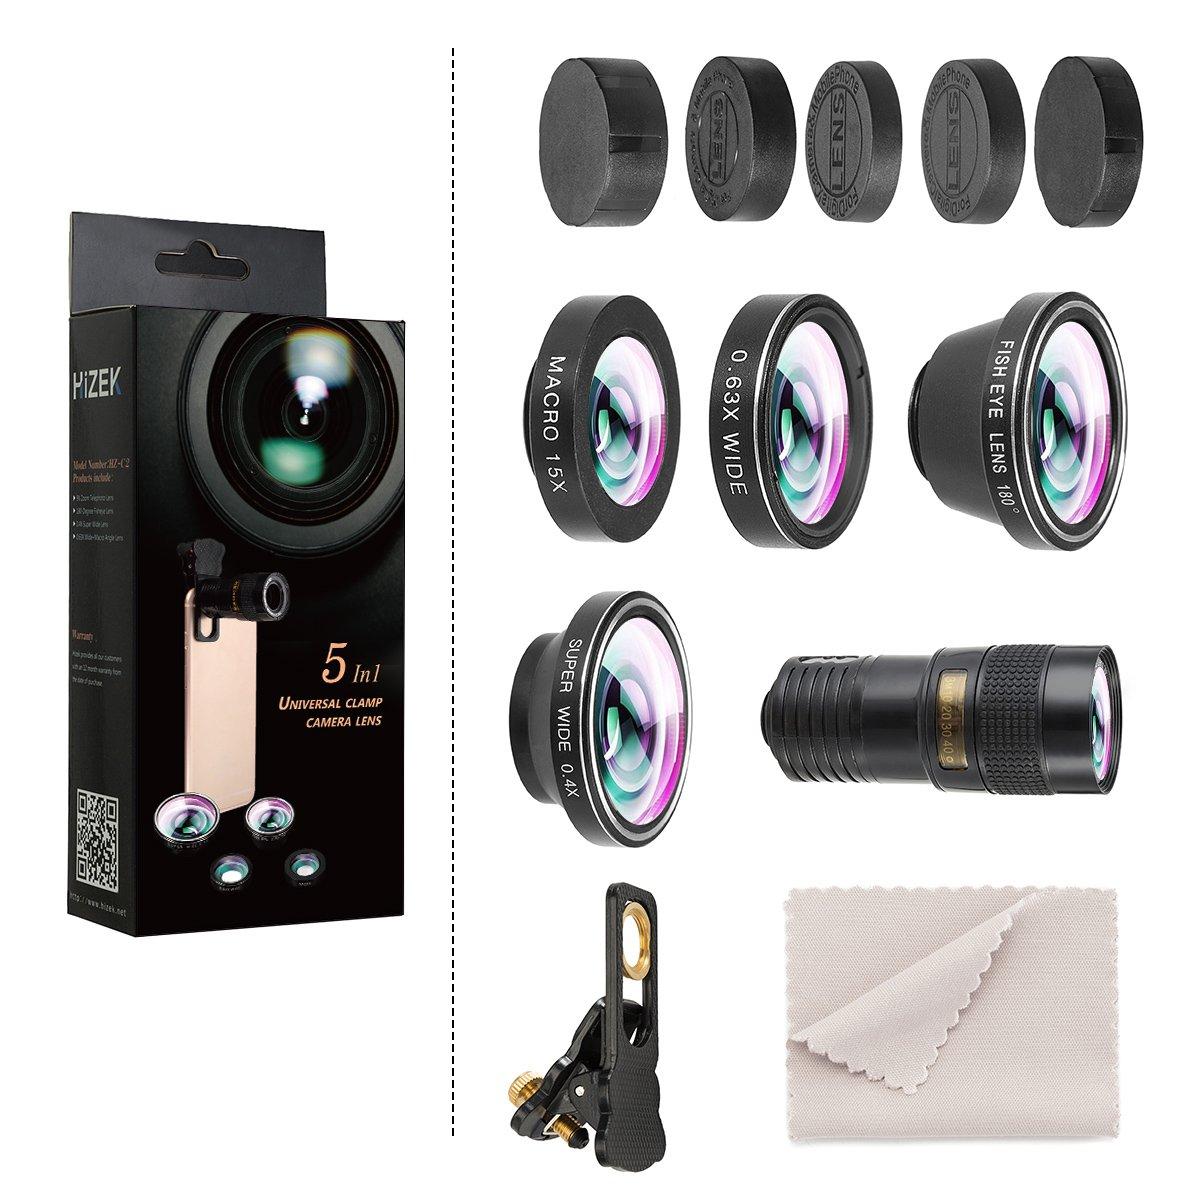 Hizek Phone Camera Lens, 180° Fisheye+0.63X Wide Angle Lens+Macro Lens+9X Telephoto Lens+0.4X Wide Lens for iPhone X/iPhone 8/7/6s/6/5,Samsung,etc 4335014500